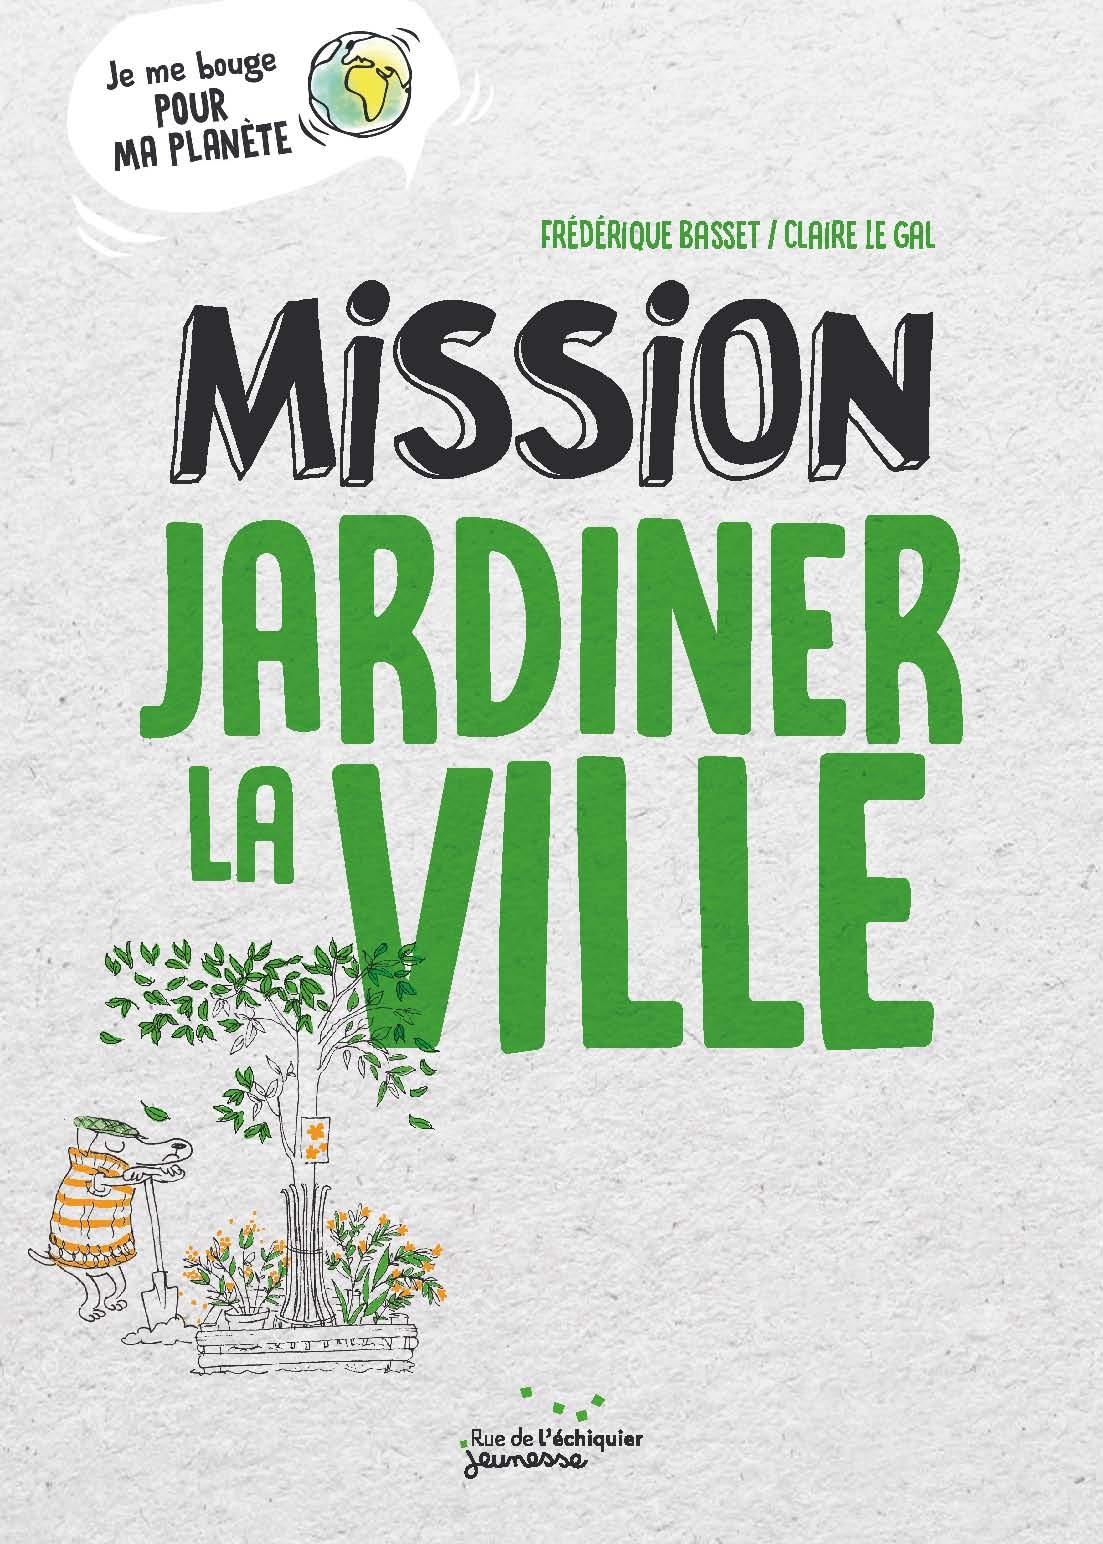 Jardiner en ville Bibliothèque Buffon Paris